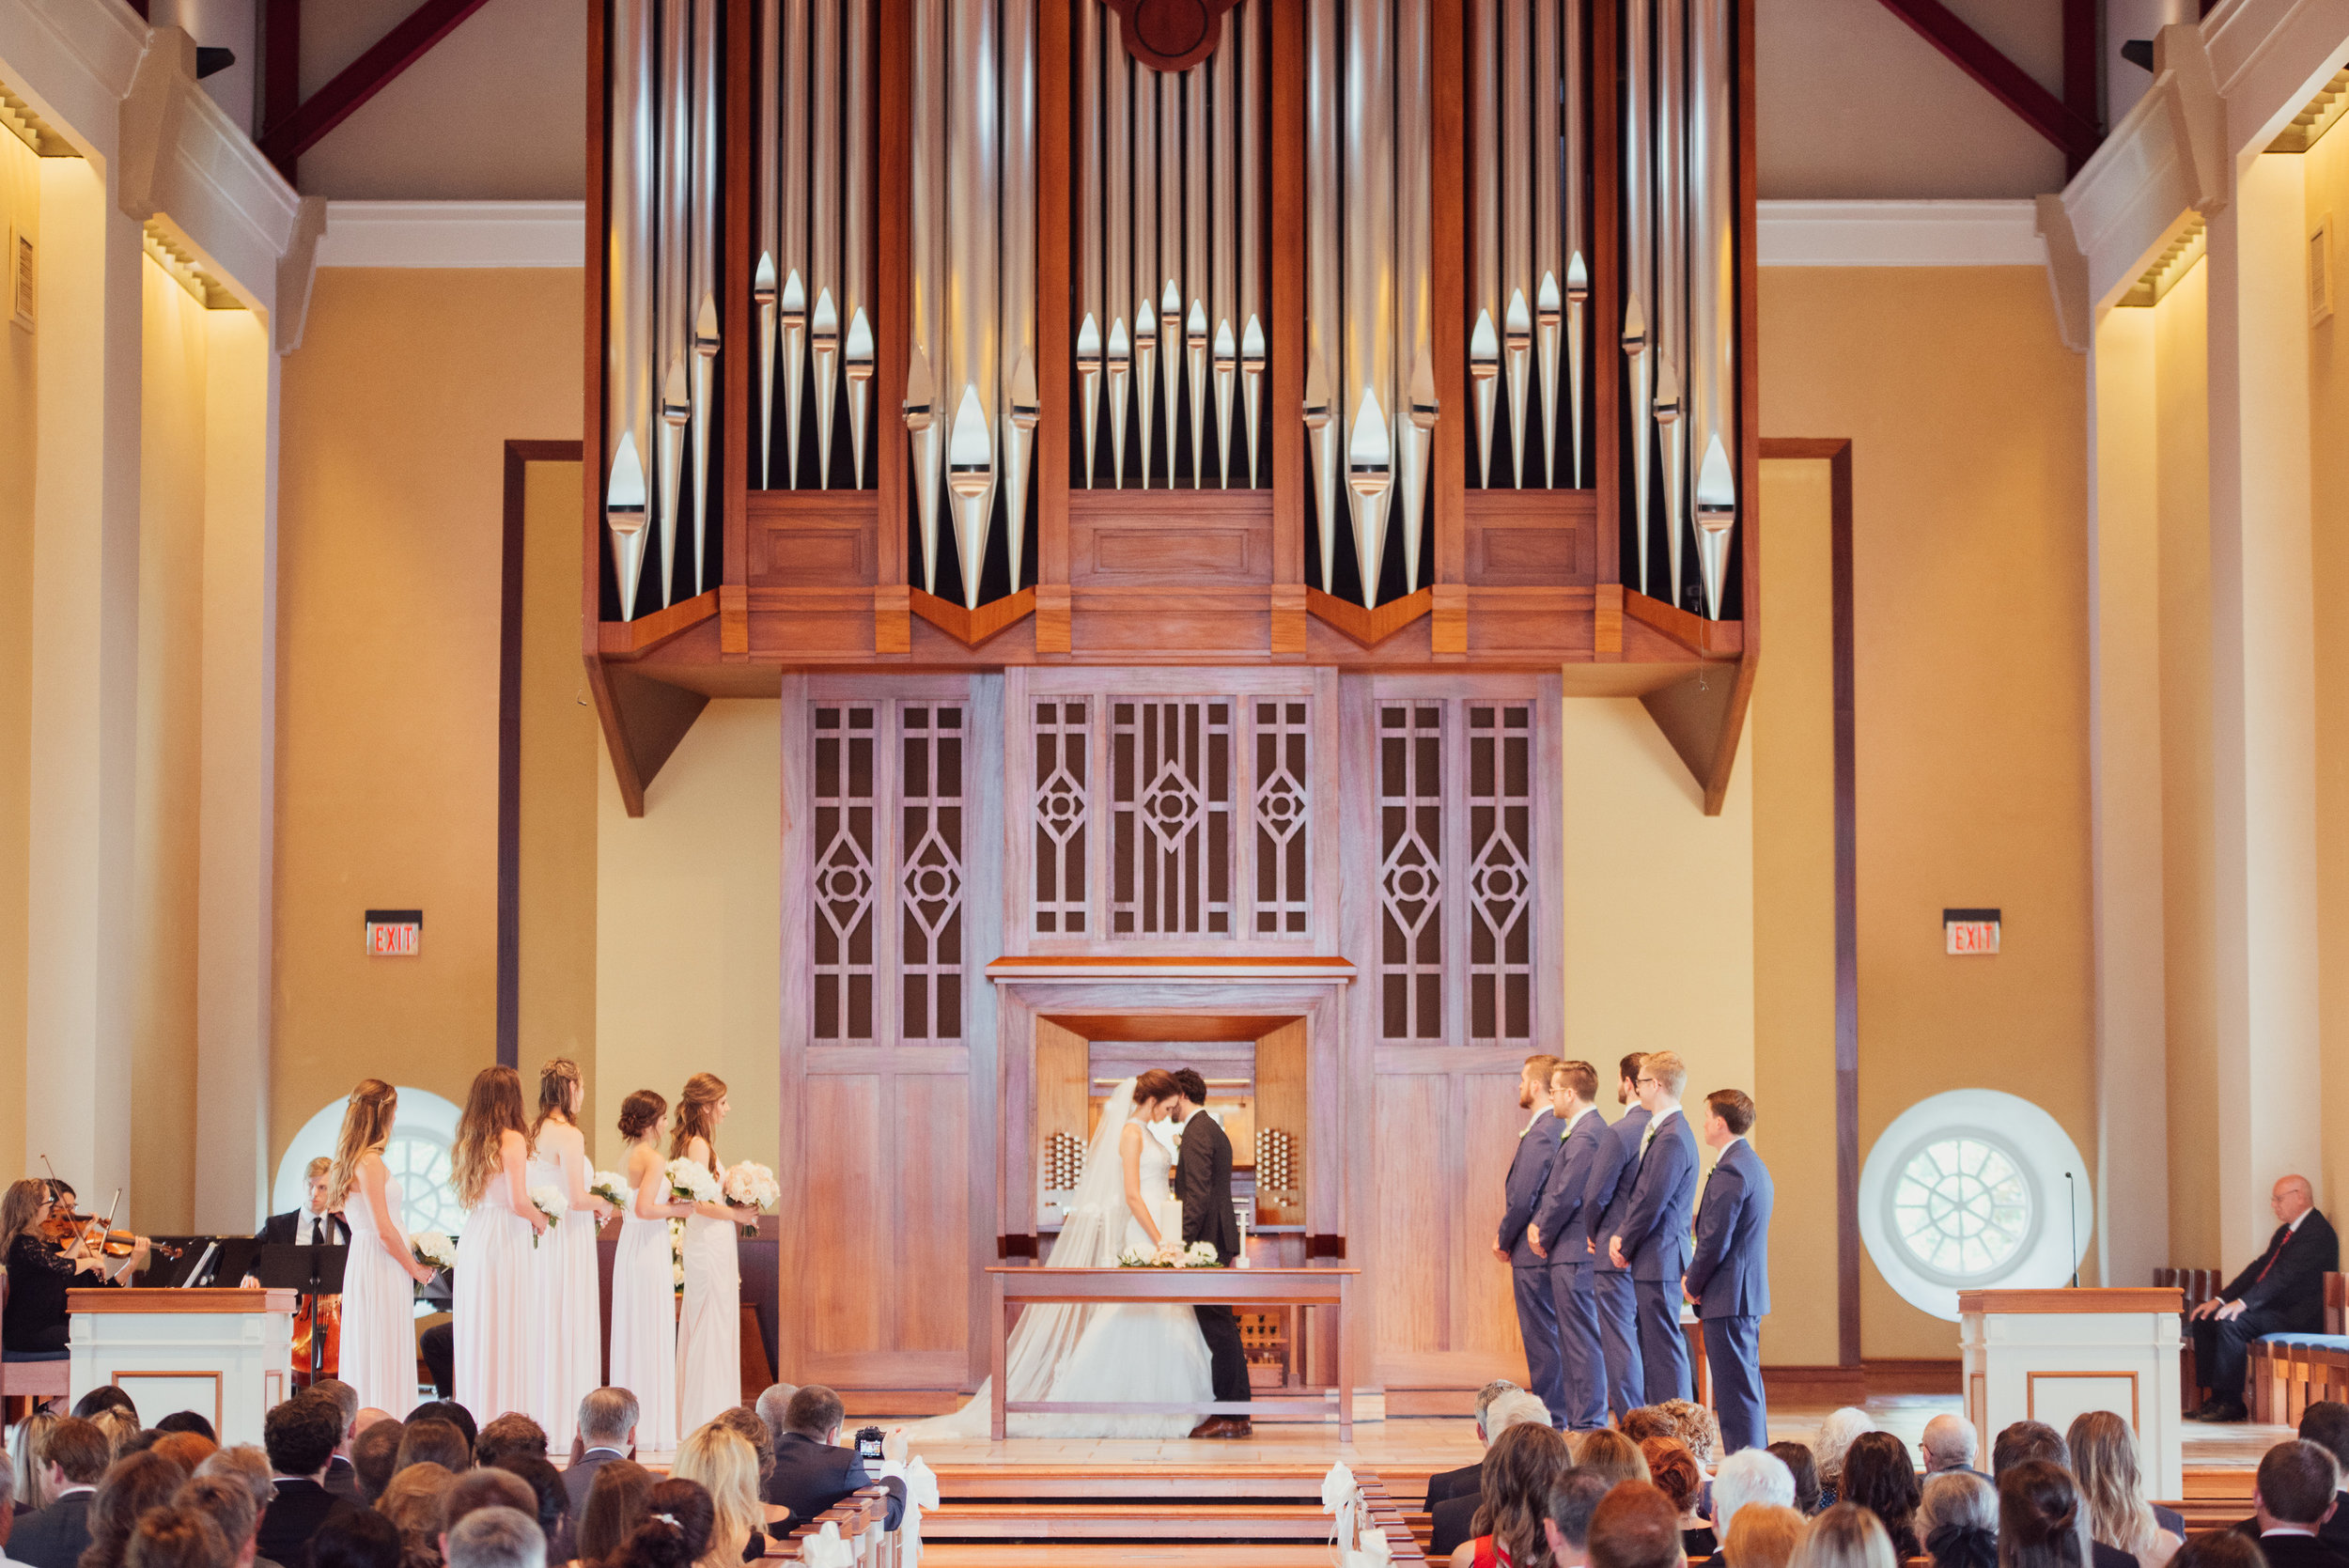 cleland-studios-wedding-photography-39.jpg